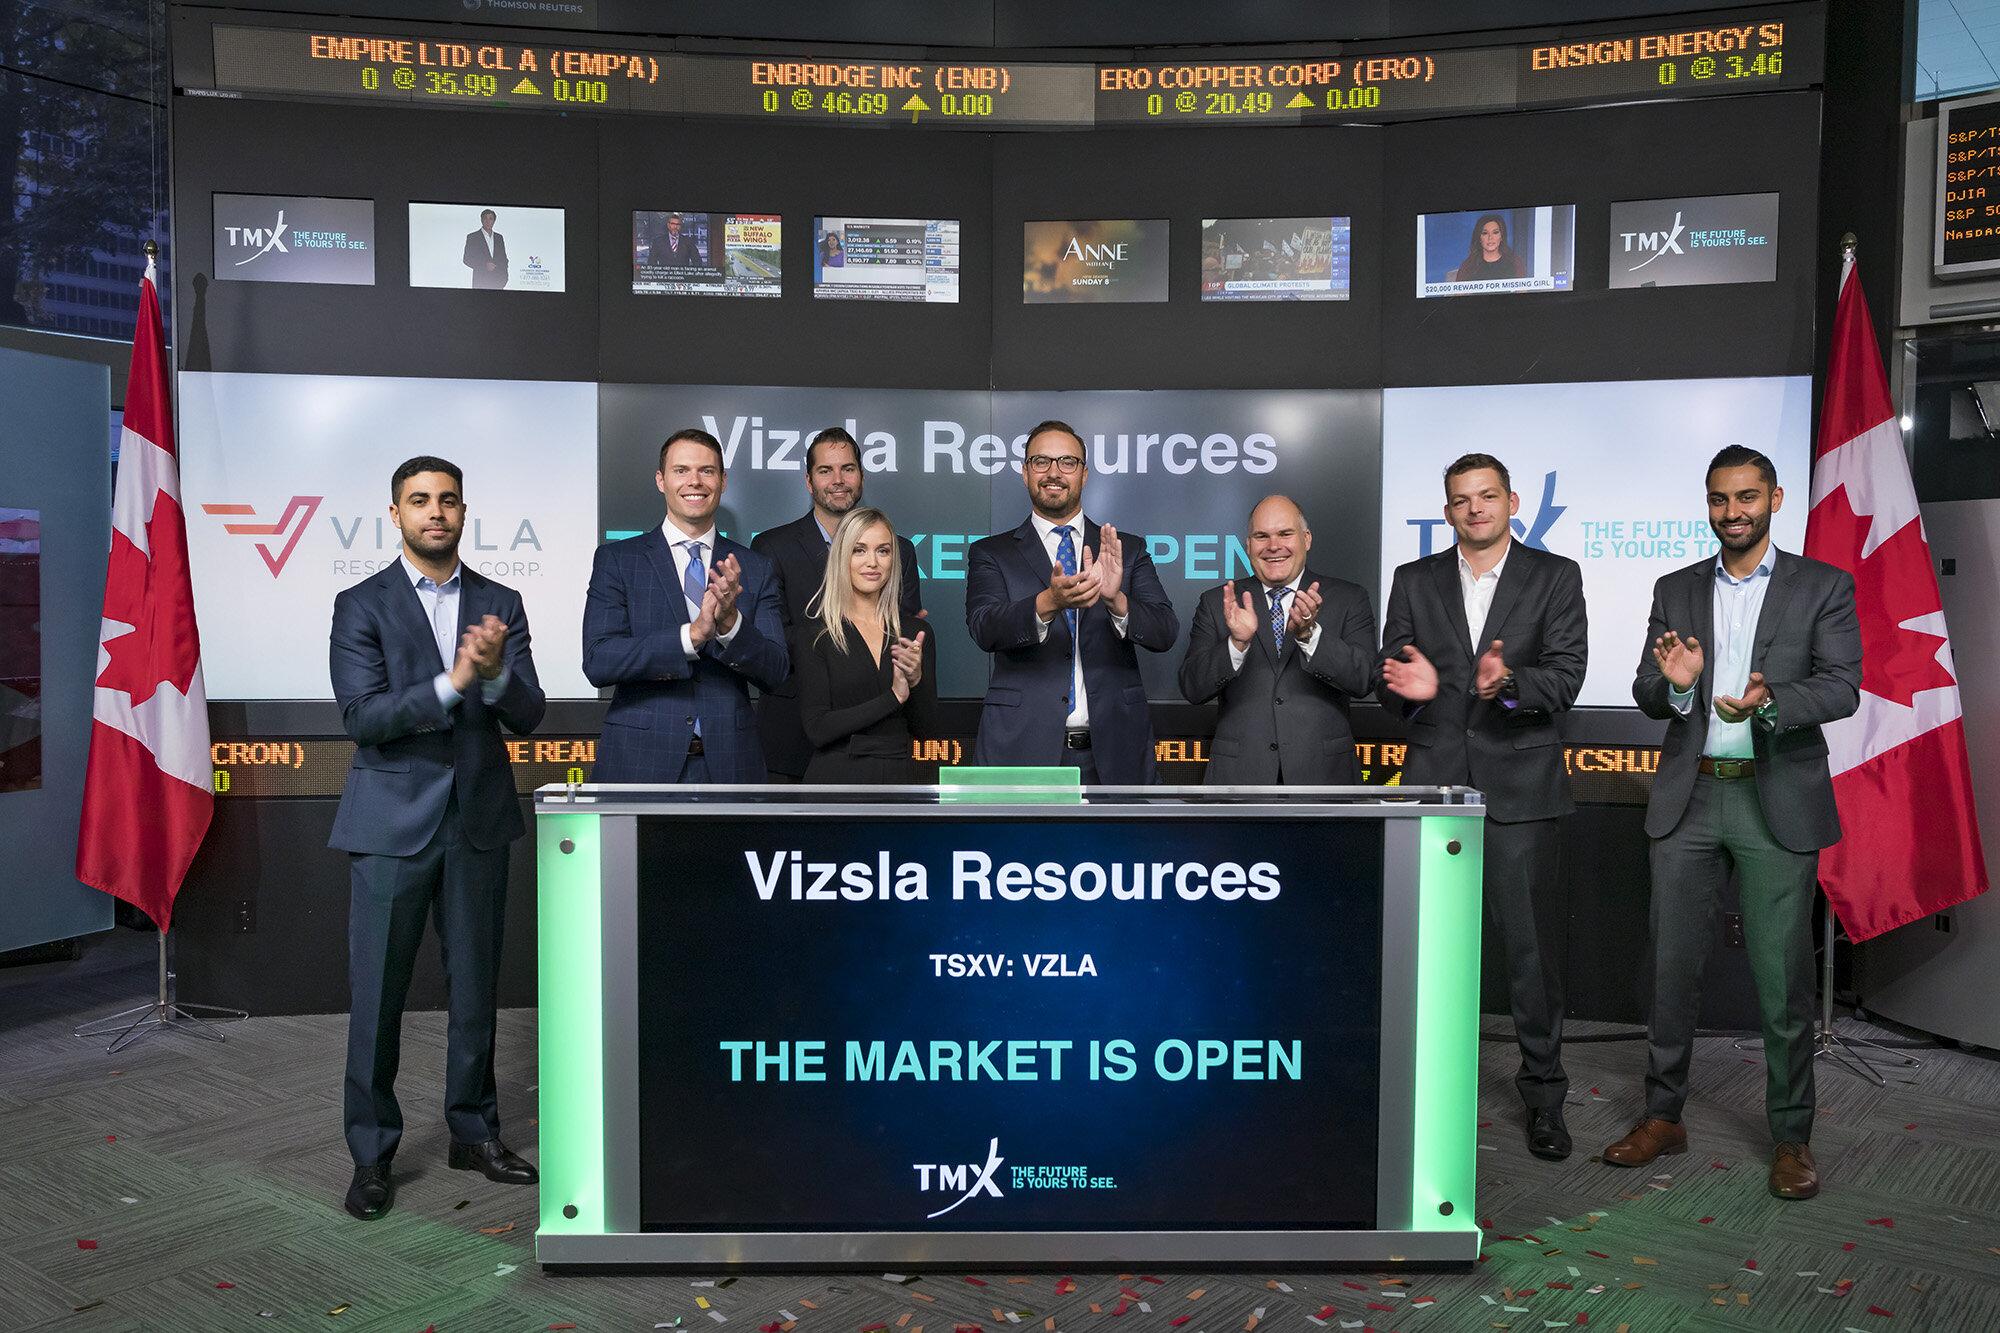 Sep-20-2019-Vizsla Resources-5756-2000x1333.jpg